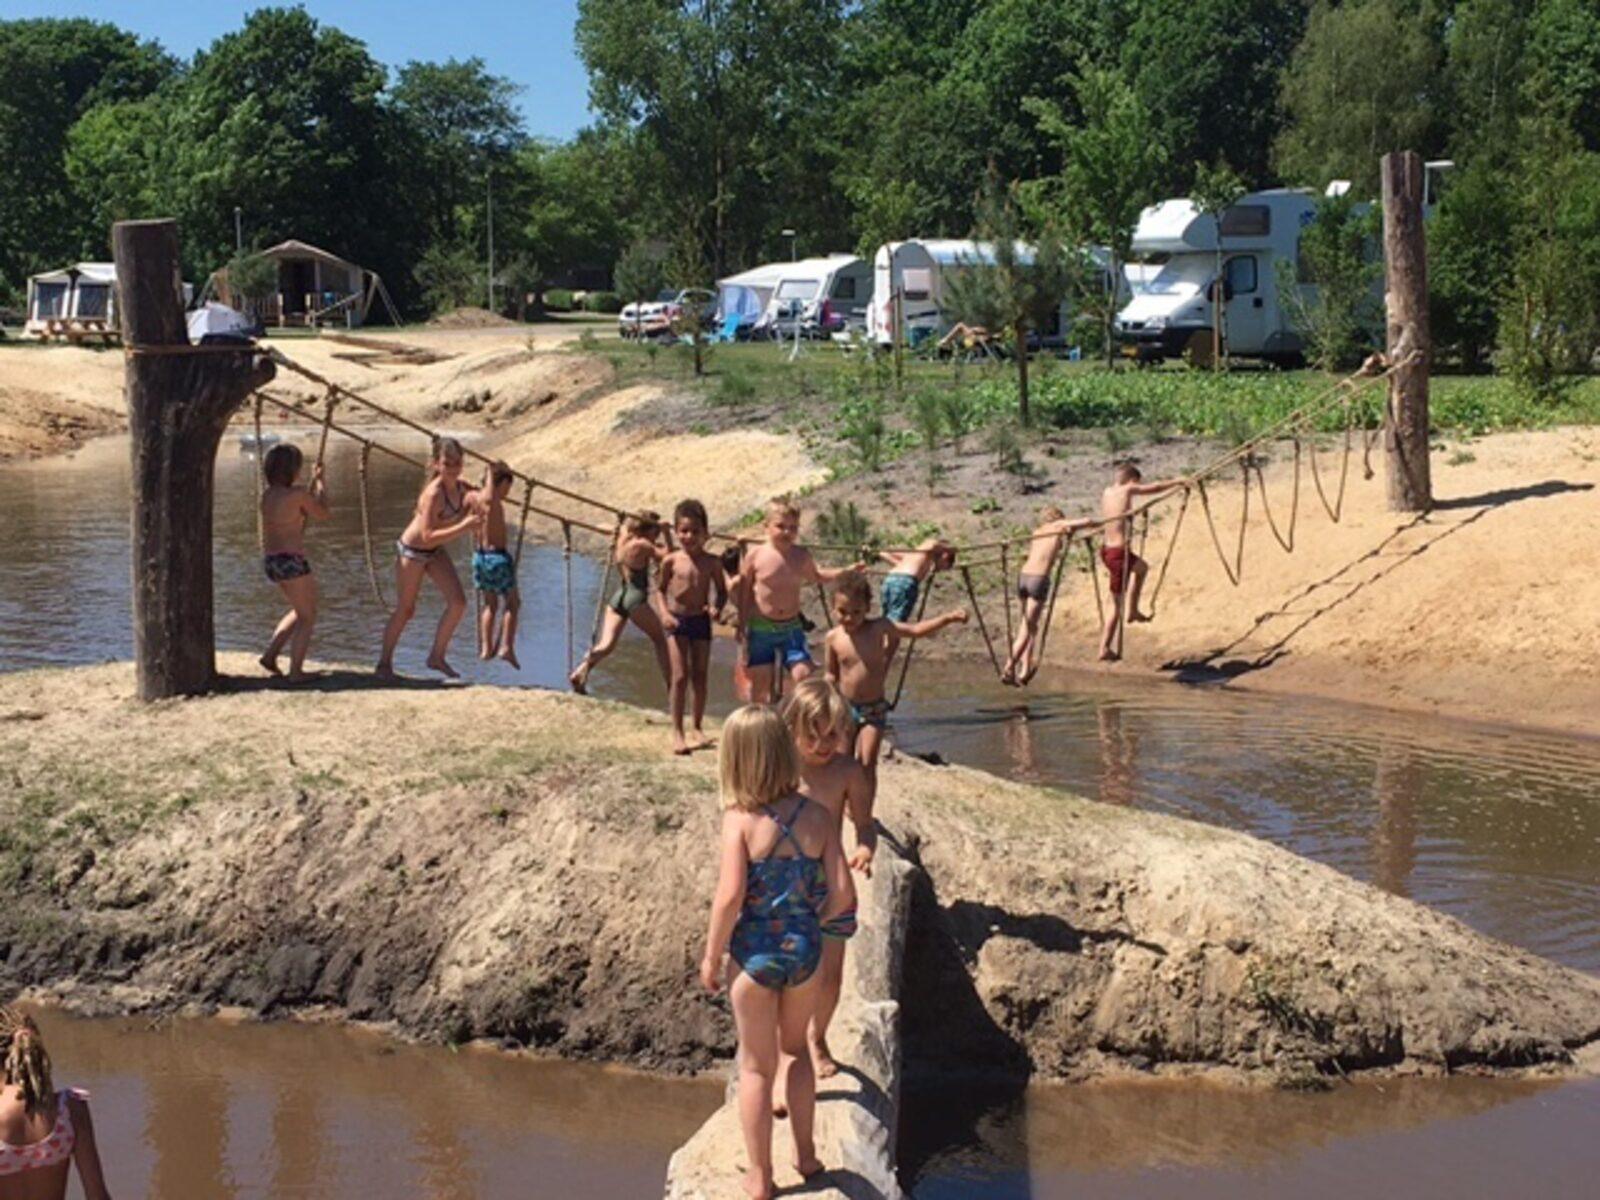 Camping-Platz